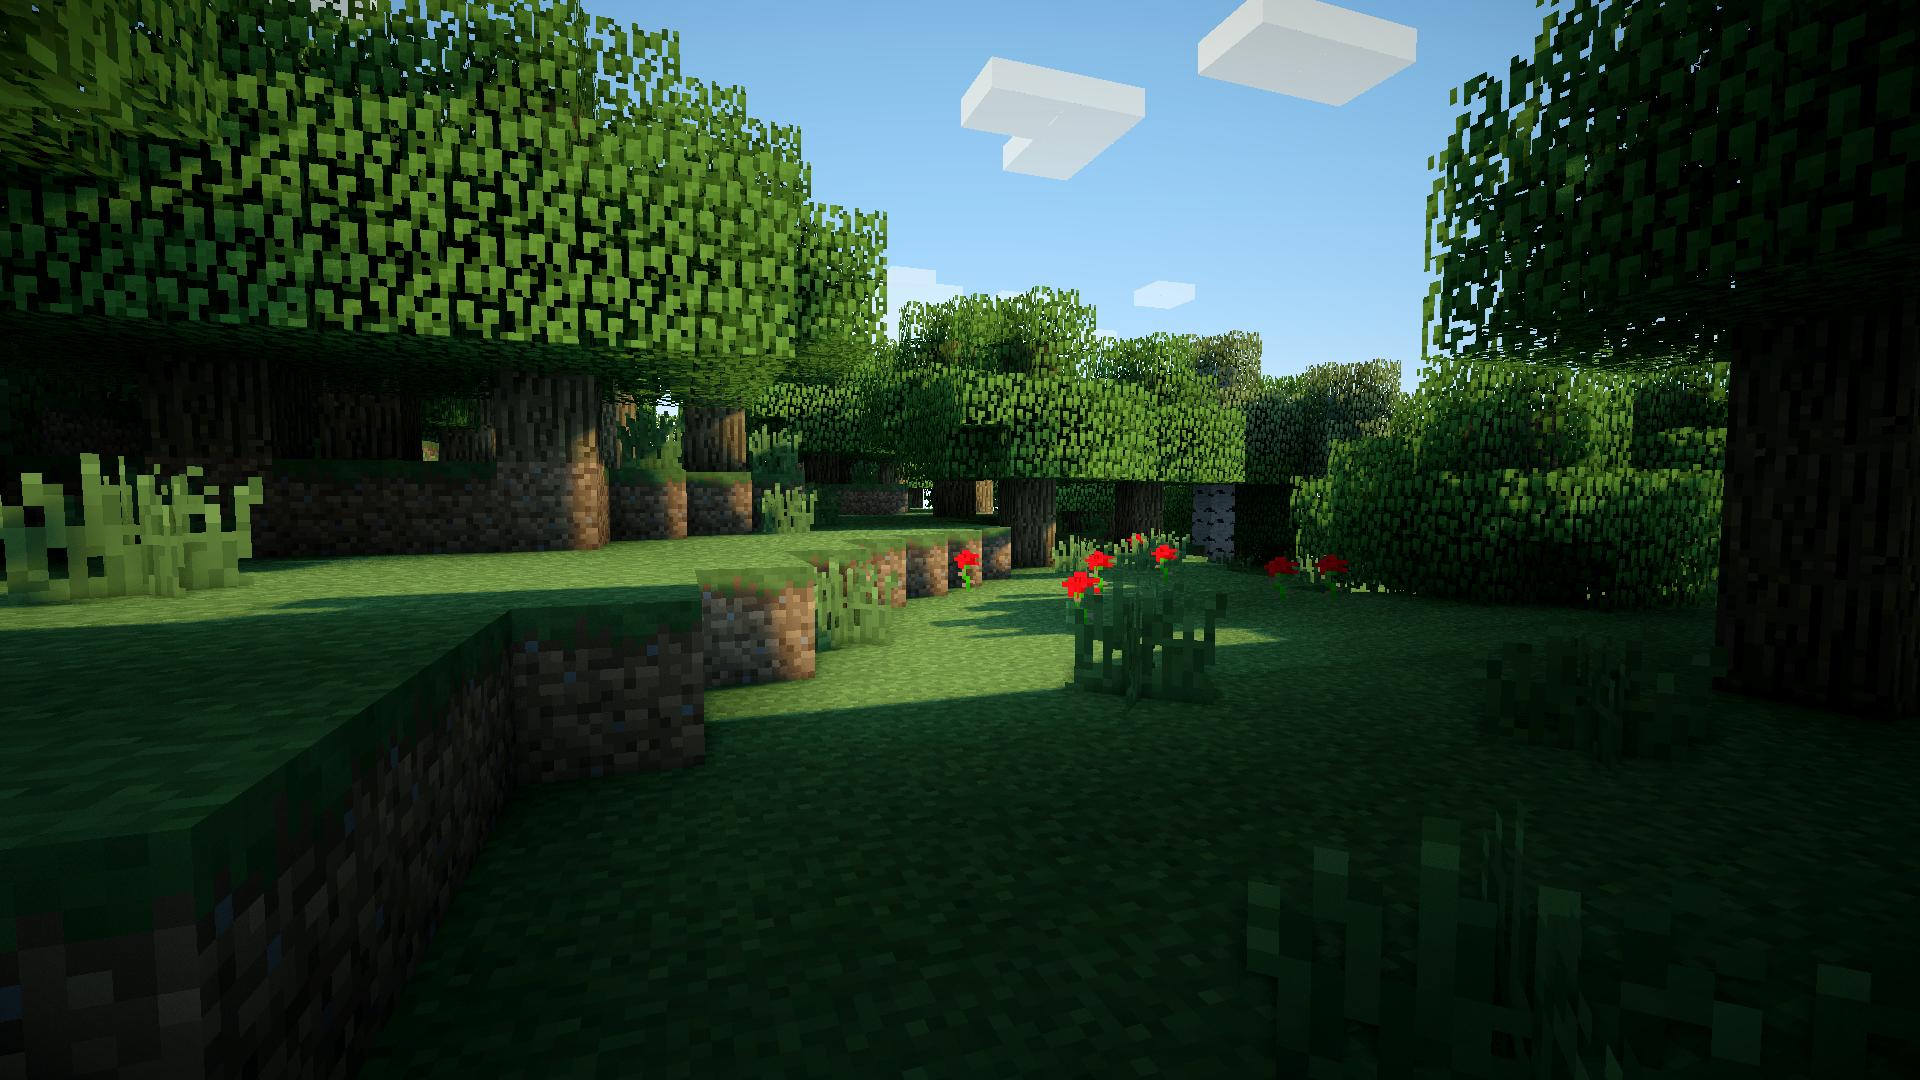 Fonds d'écrans - Hello Minecraft - Fond D'ecran Minecraft